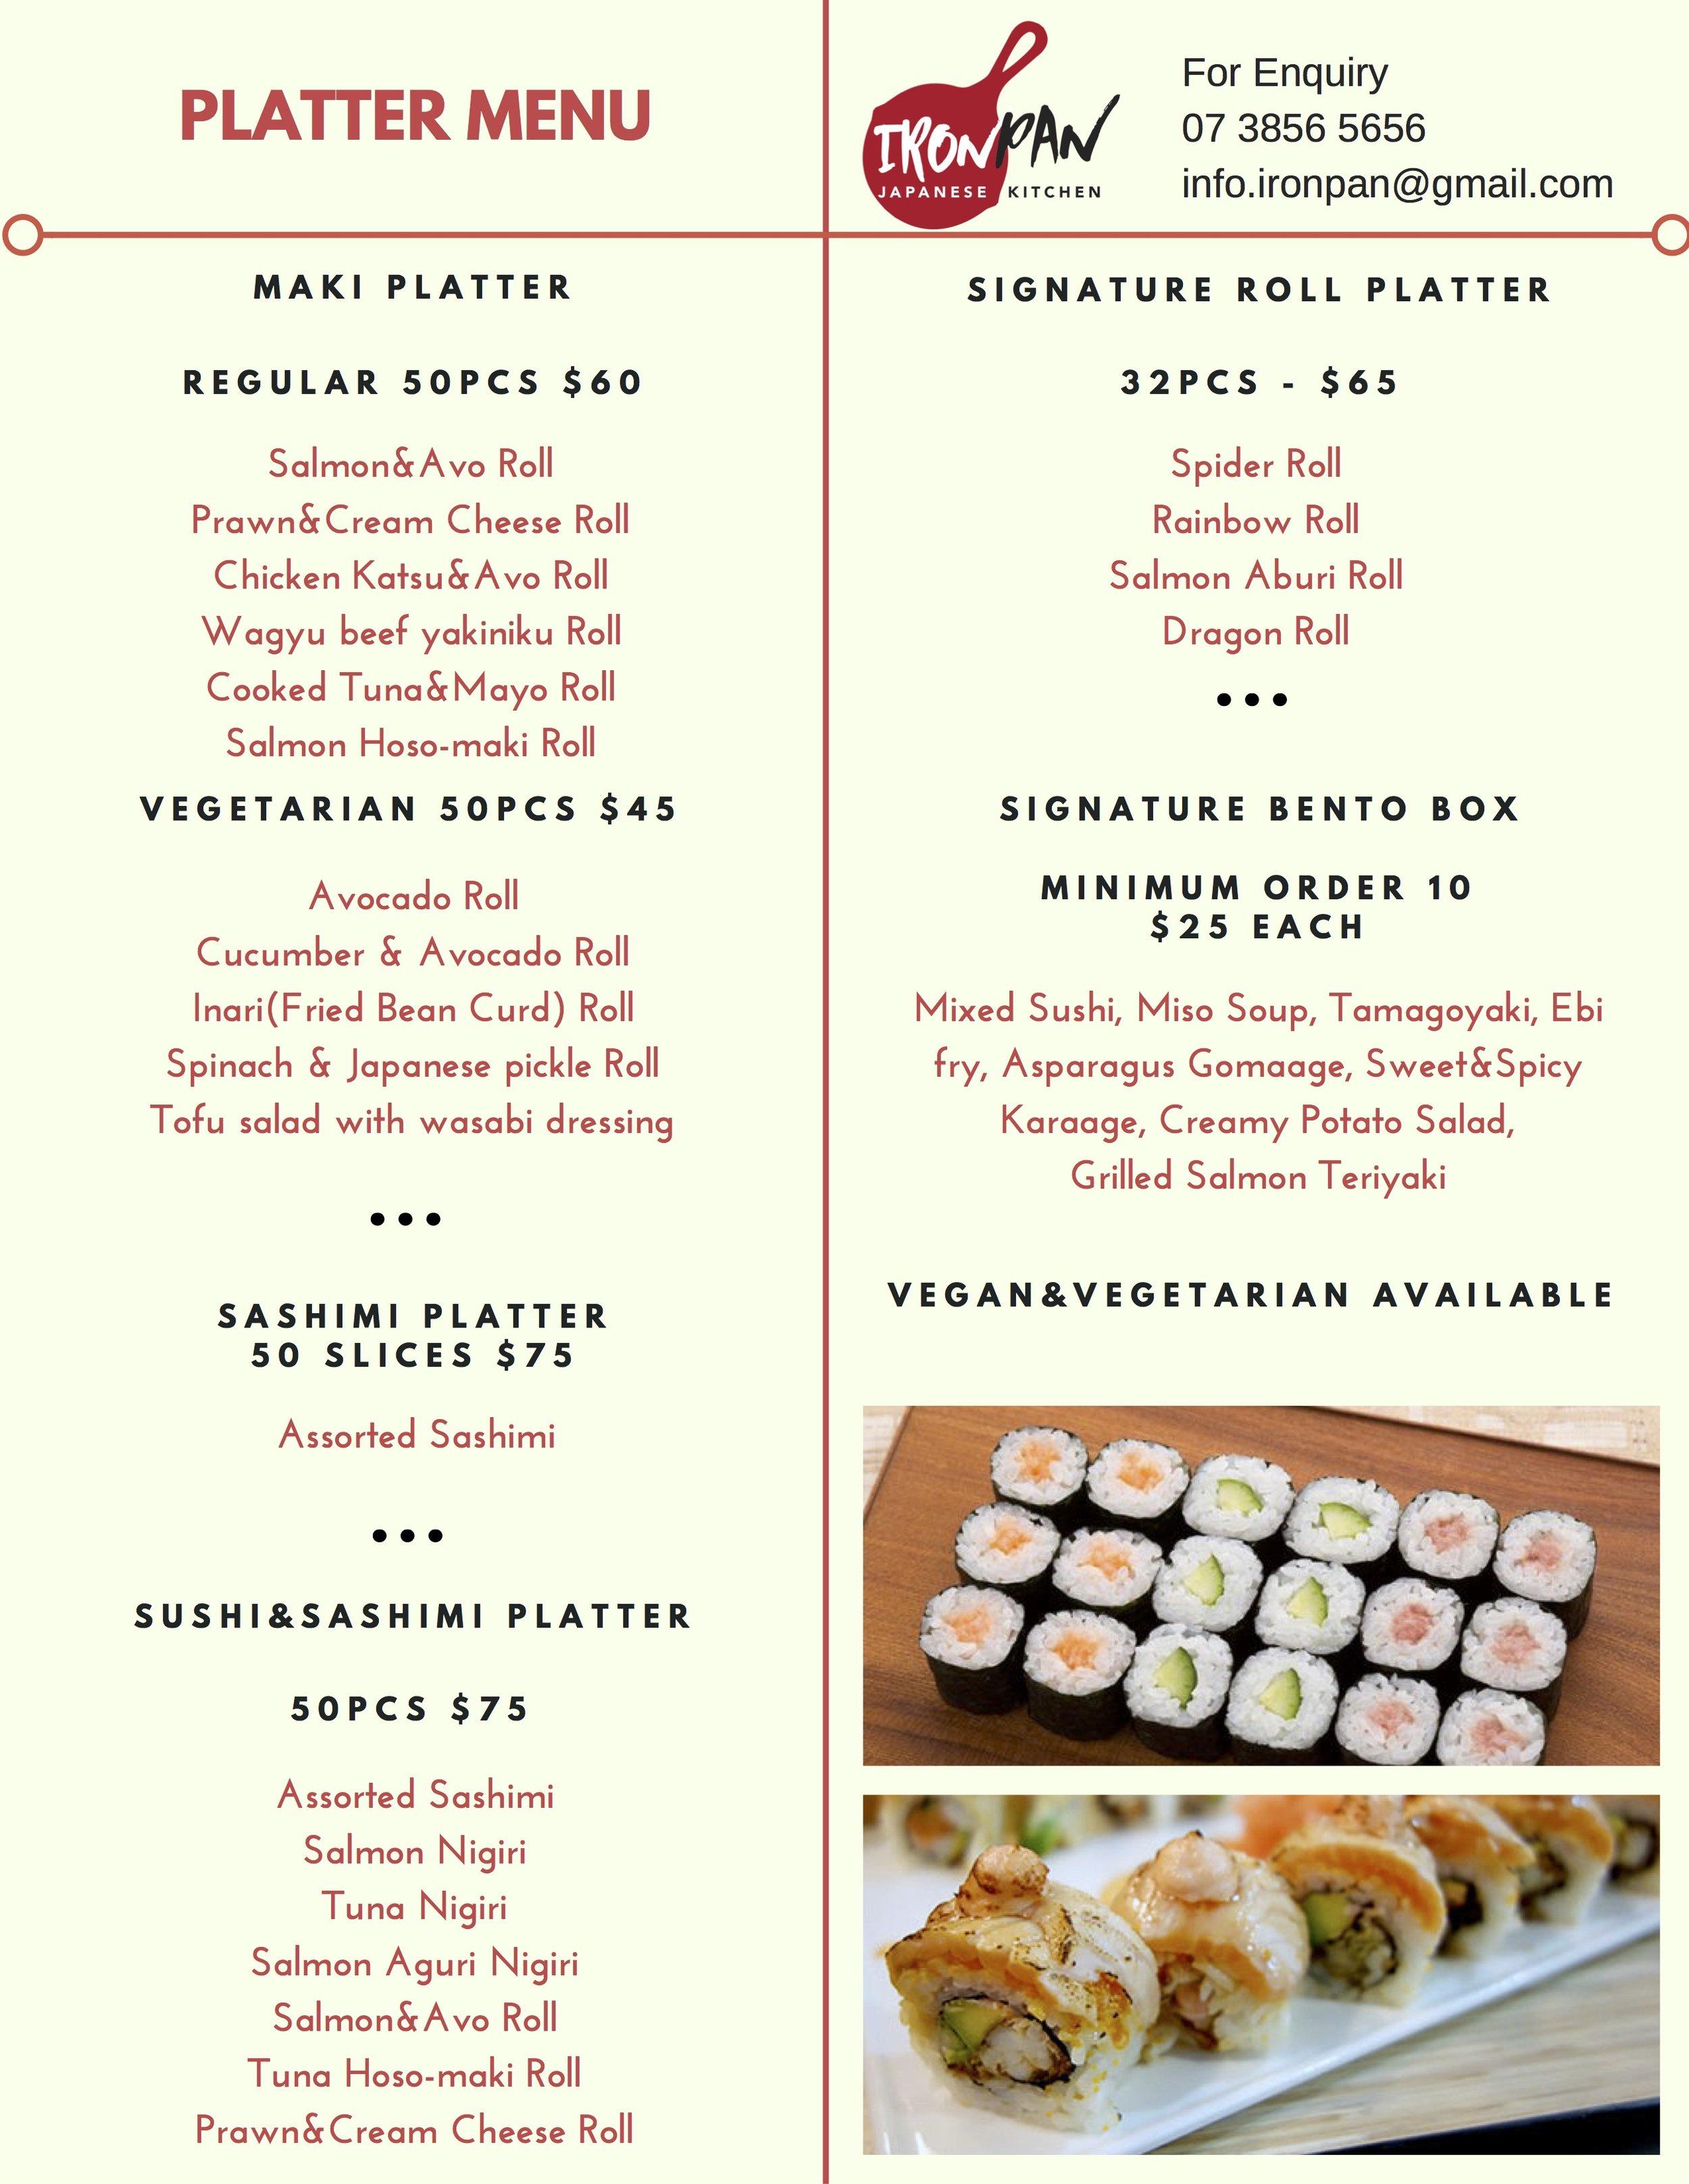 Platter menu